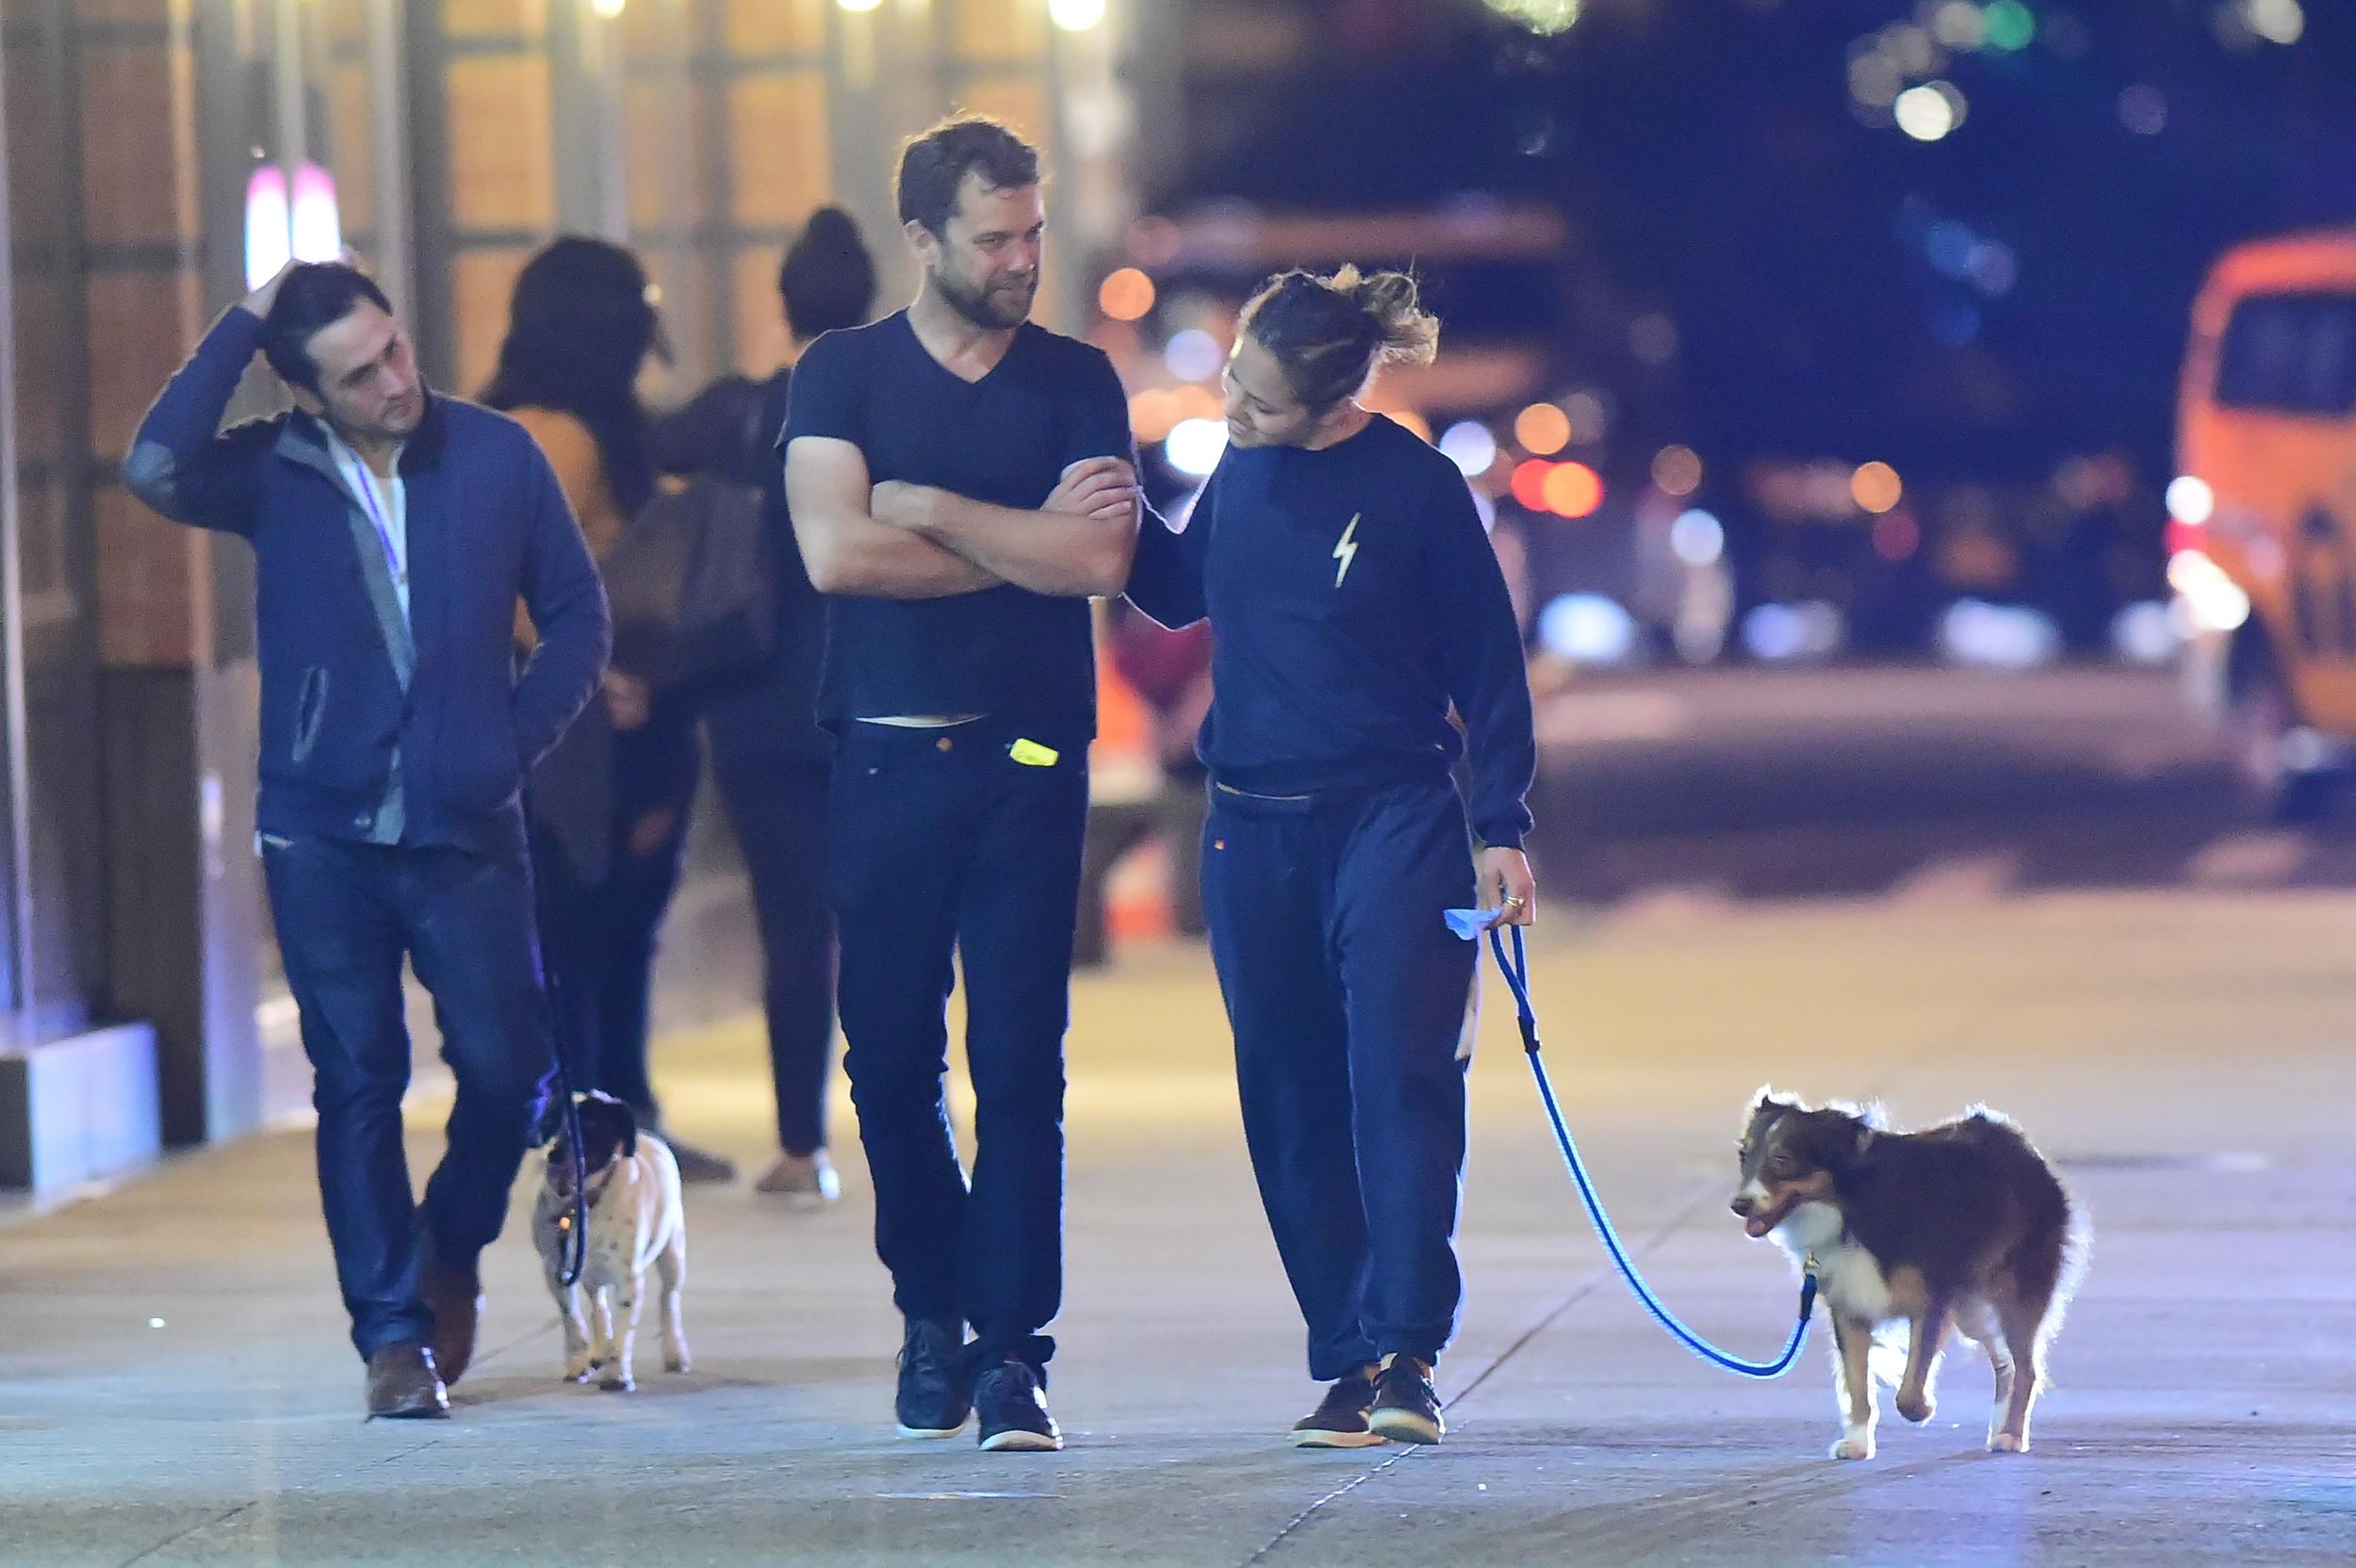 Margarita Levieva și Joshua, la o plimbare prin New York, alături de cățelușa actirței